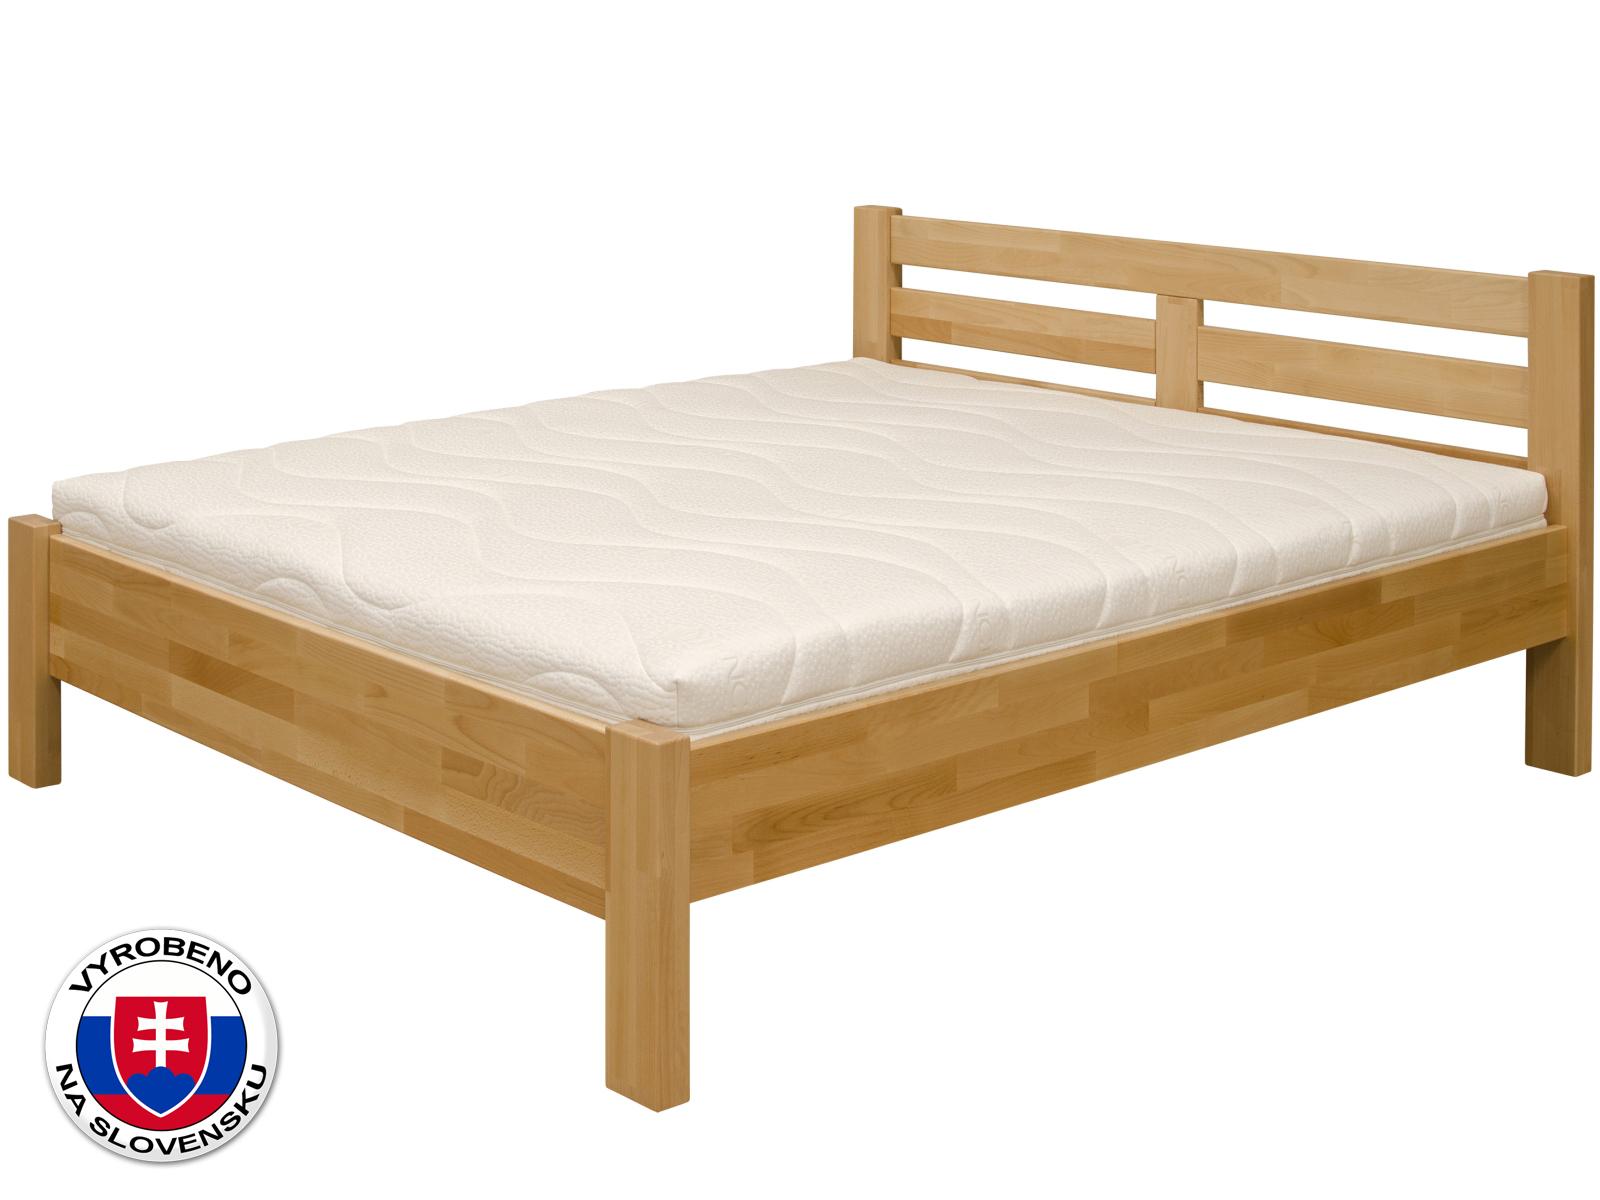 Manželská postel 140 cm - Purtex - Mia (masiv)